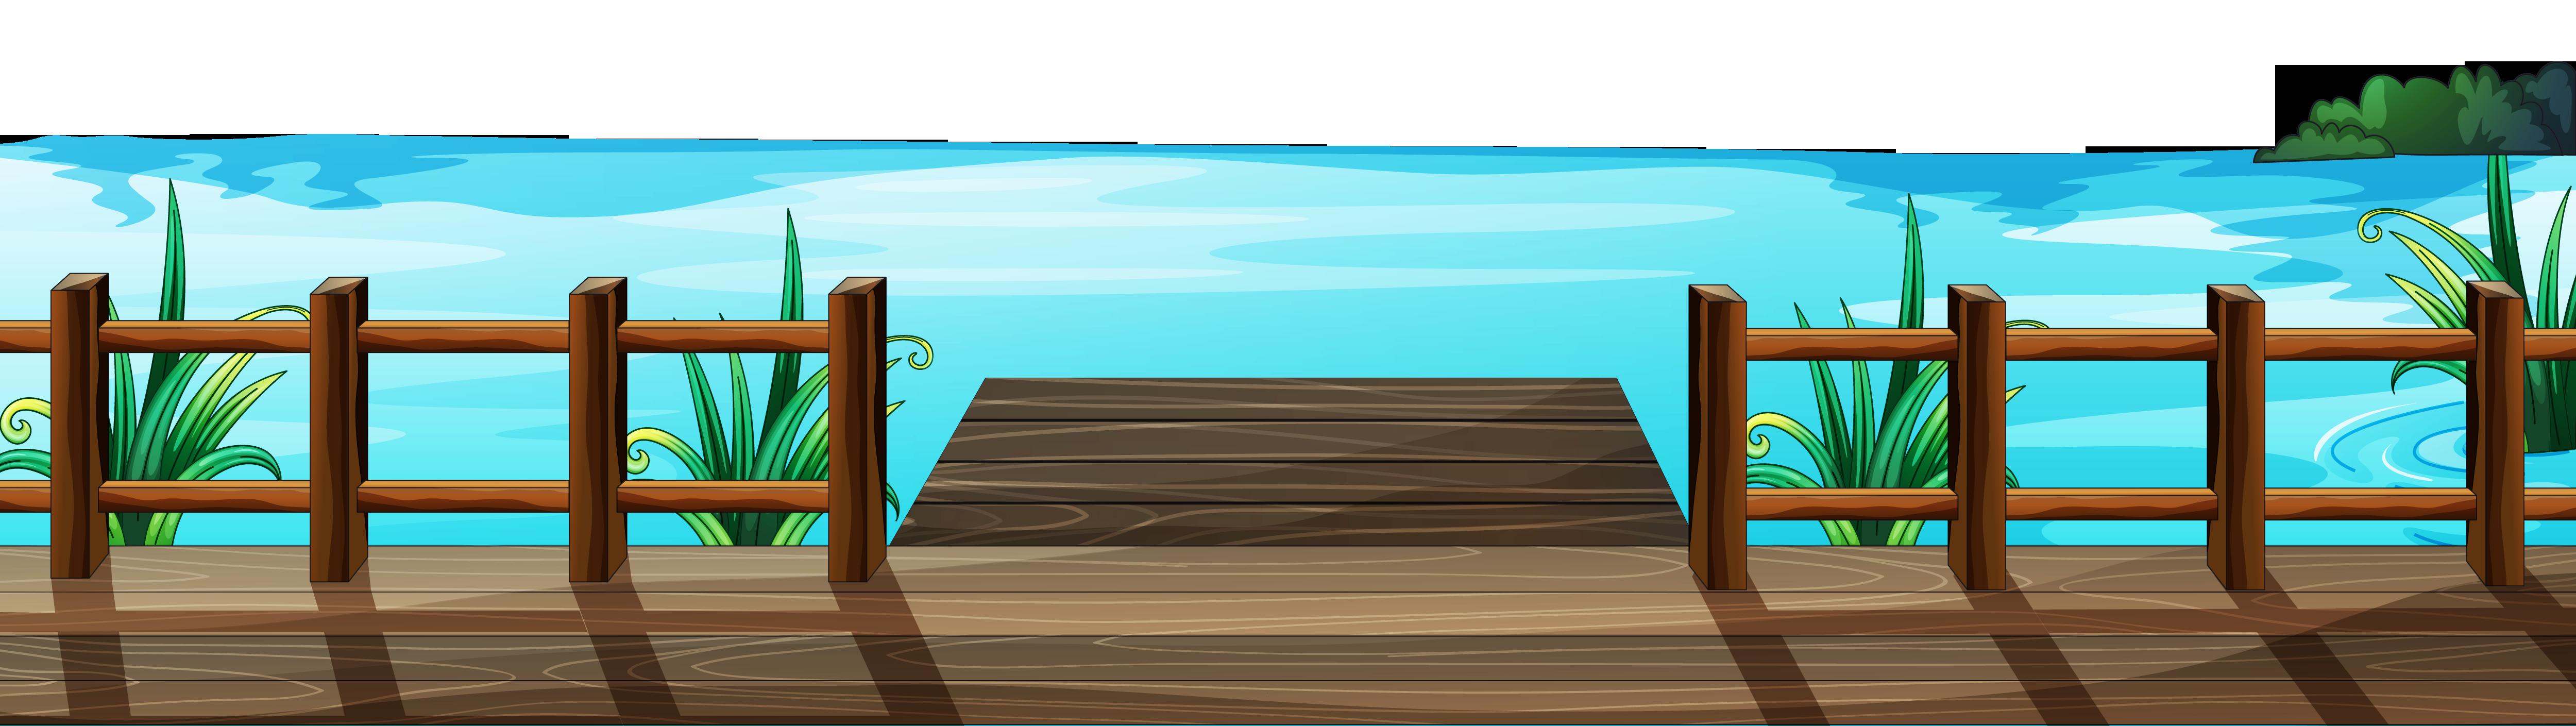 Dock clip art.